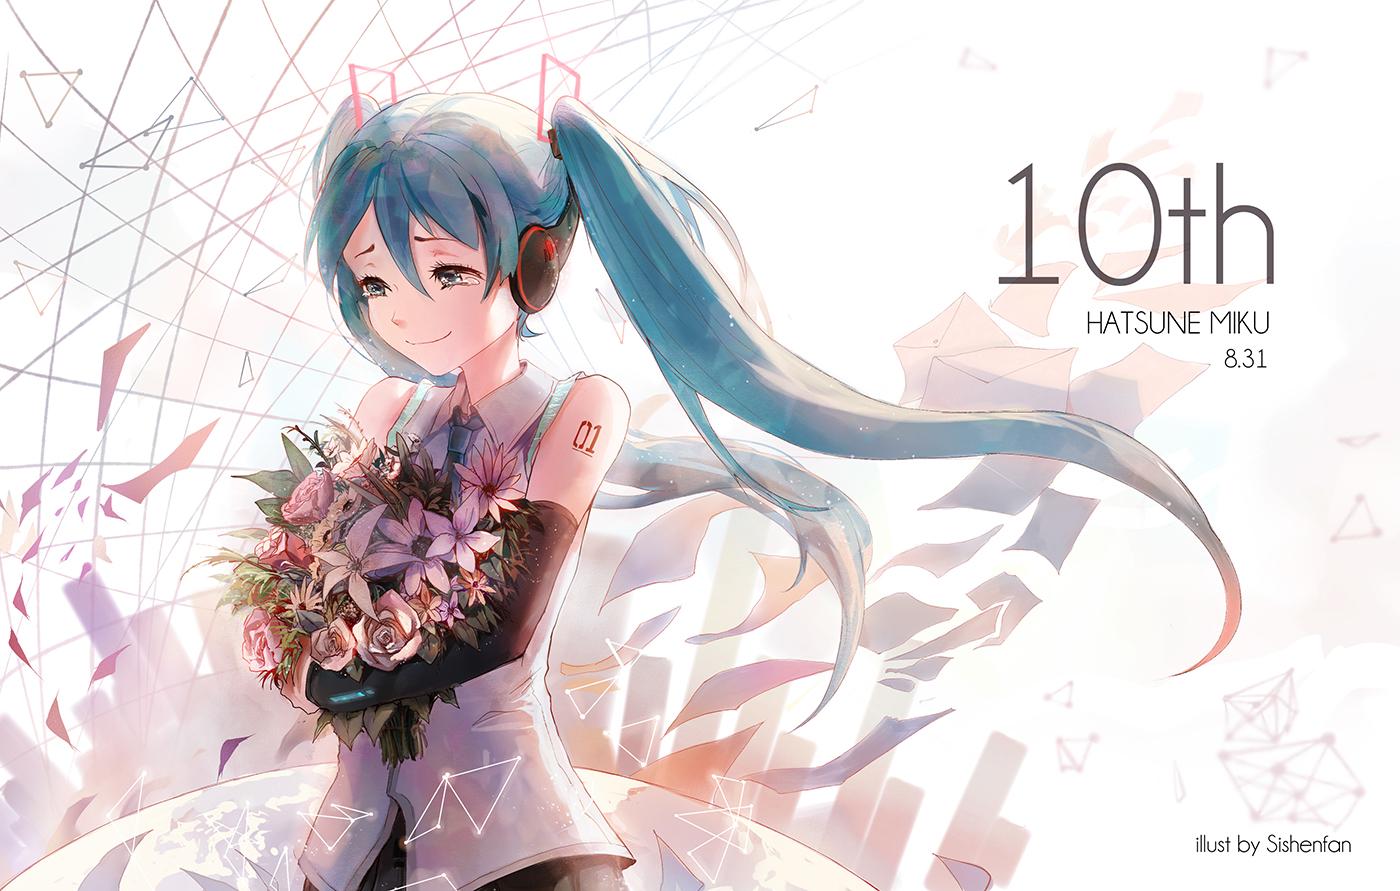 blue_eyes blue_hair flowers hatsune_miku headphones long_hair sishenfan tattoo tears tie vocaloid watermark